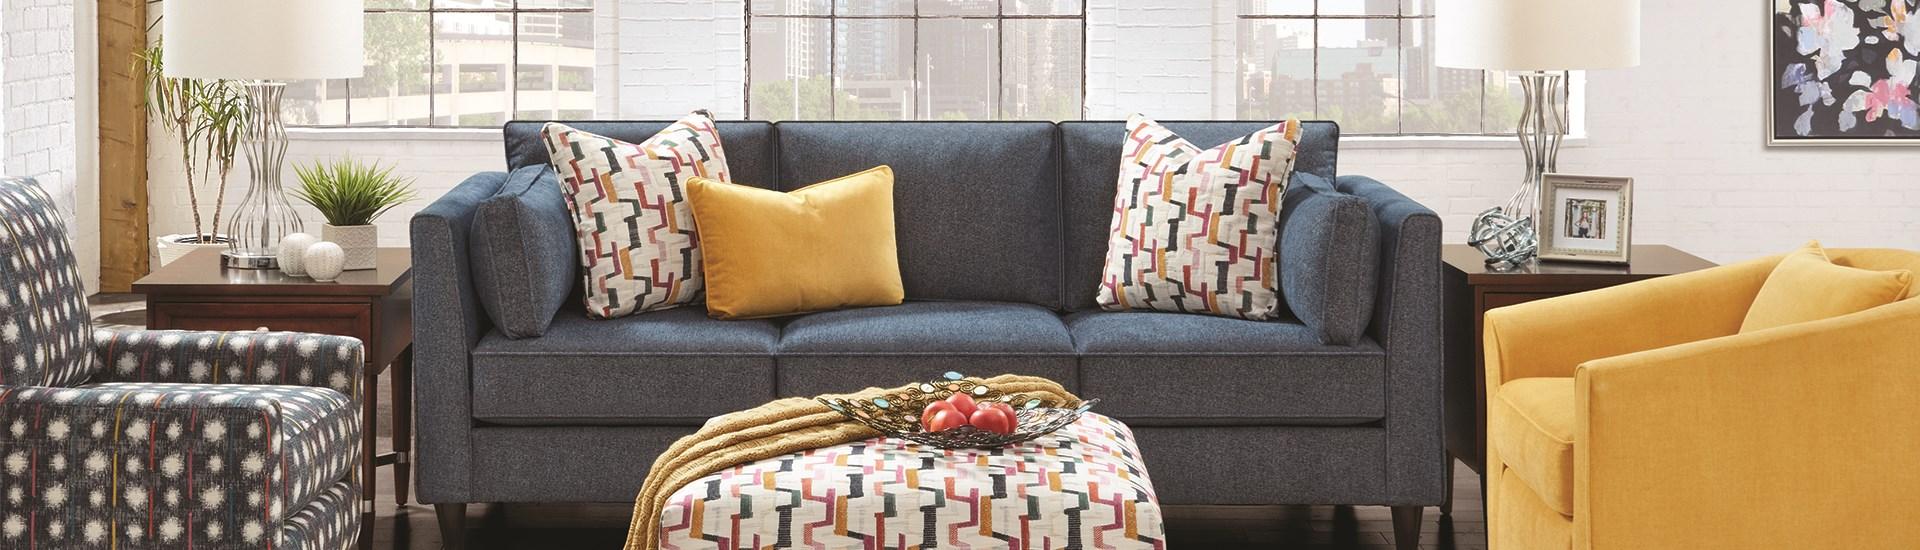 Living Room Furniture Becker